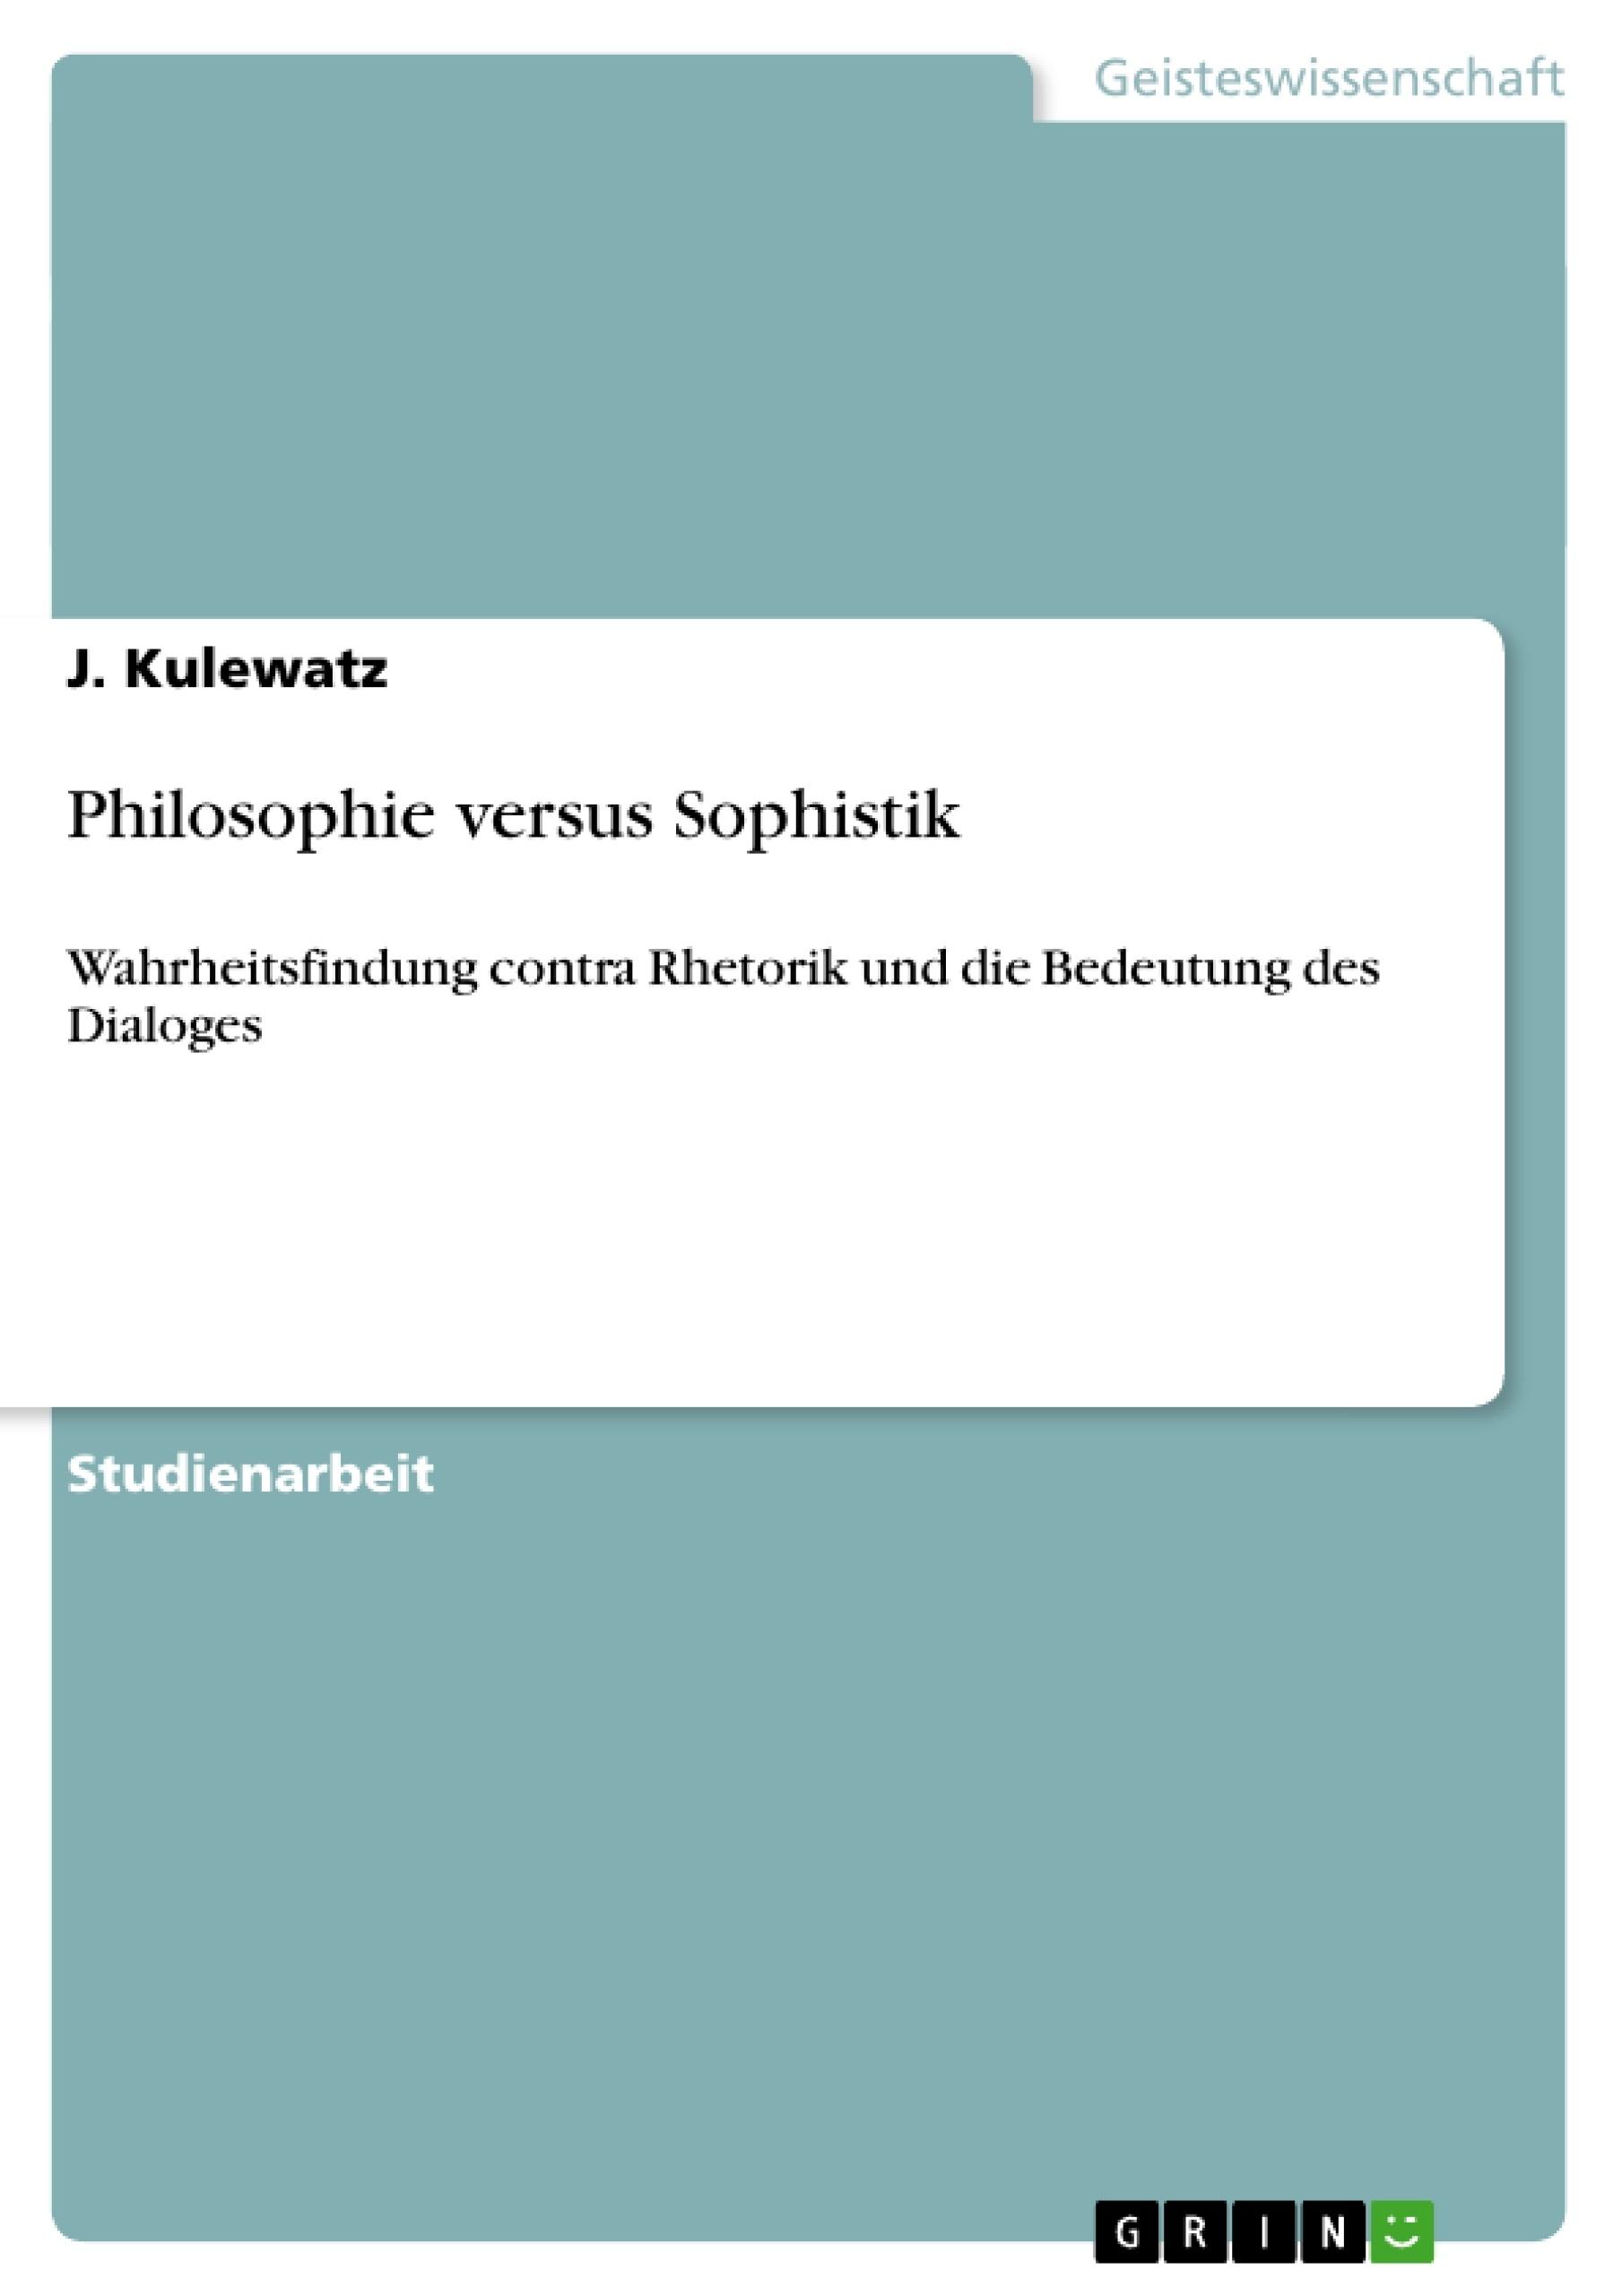 Titel: Philosophie versus Sophistik